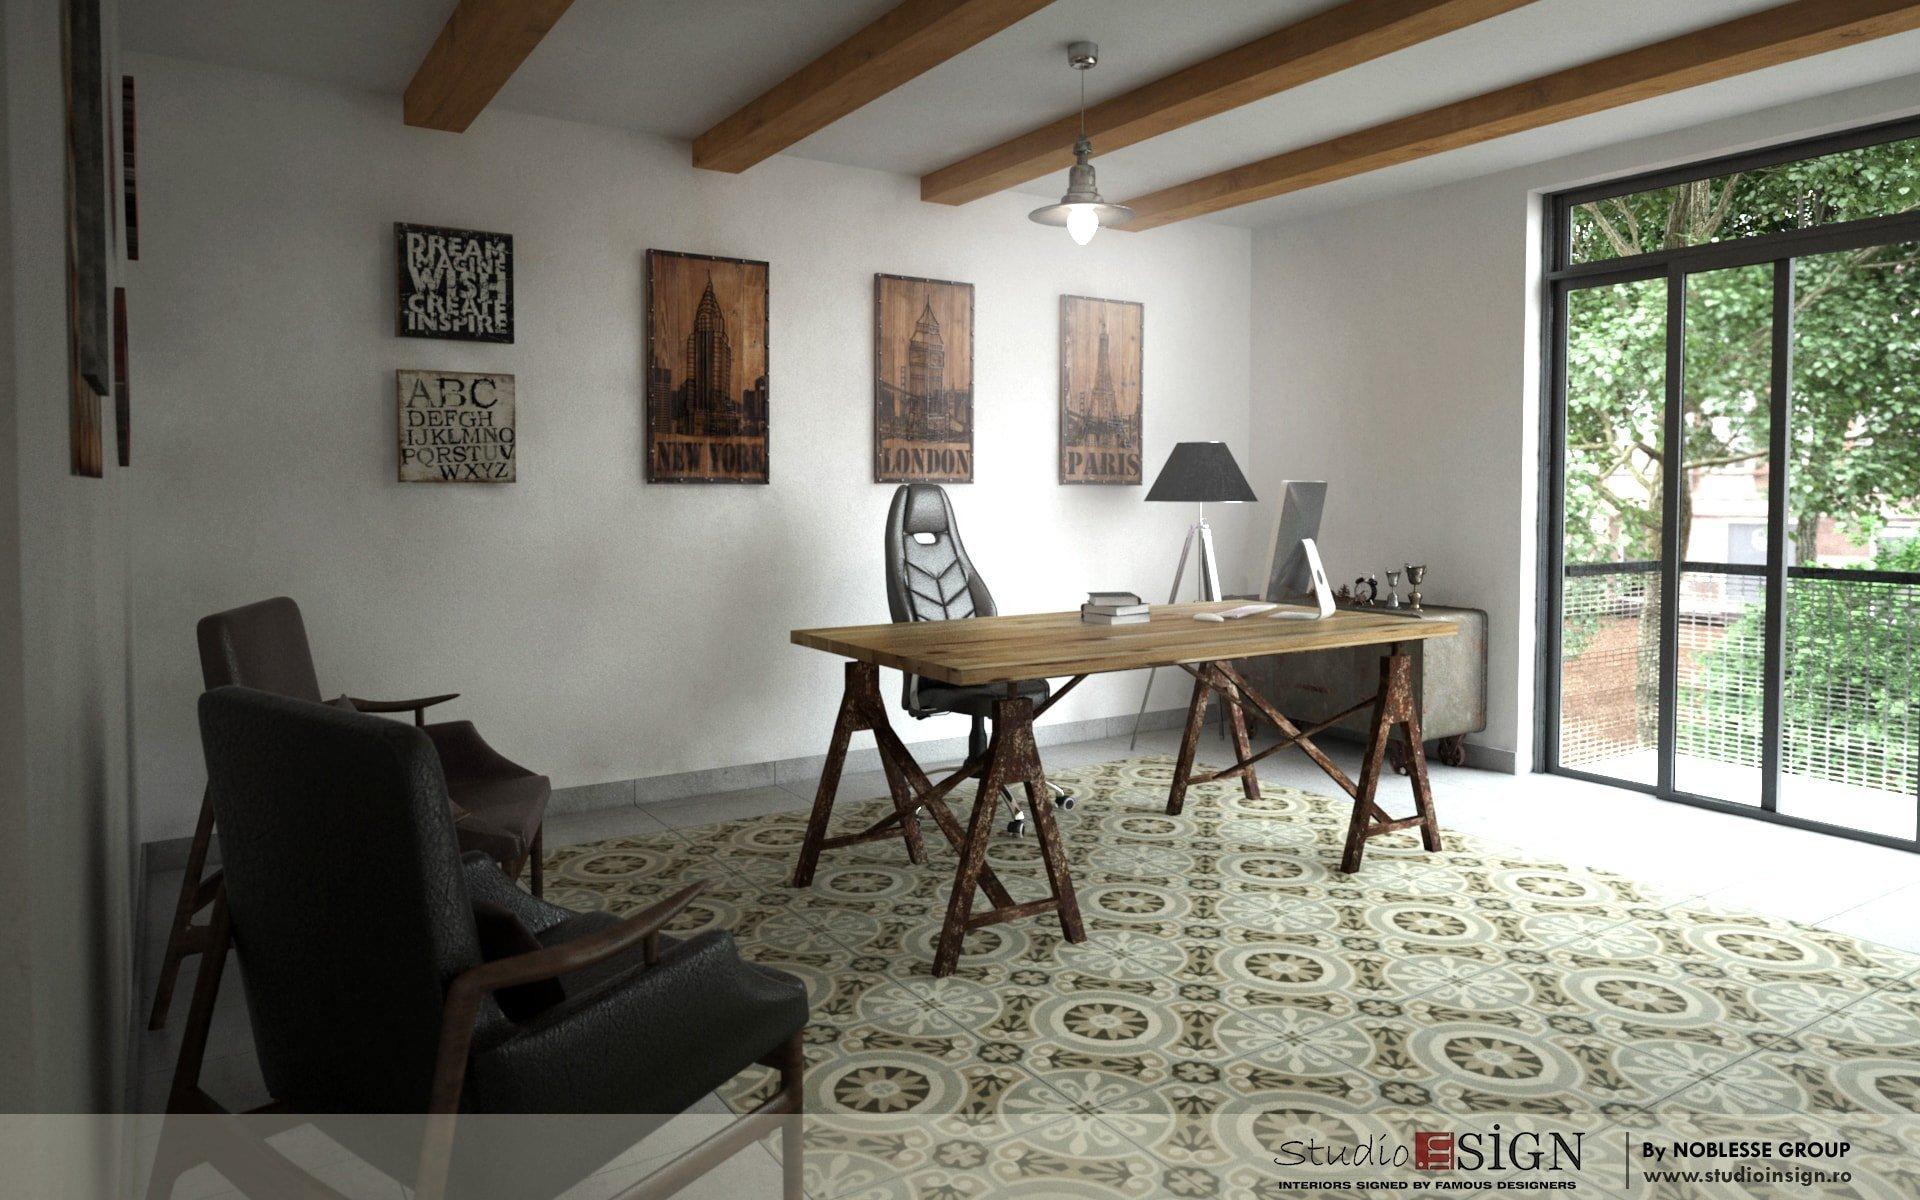 birouri white impex craiova design interior in stil vintage industrial. Black Bedroom Furniture Sets. Home Design Ideas